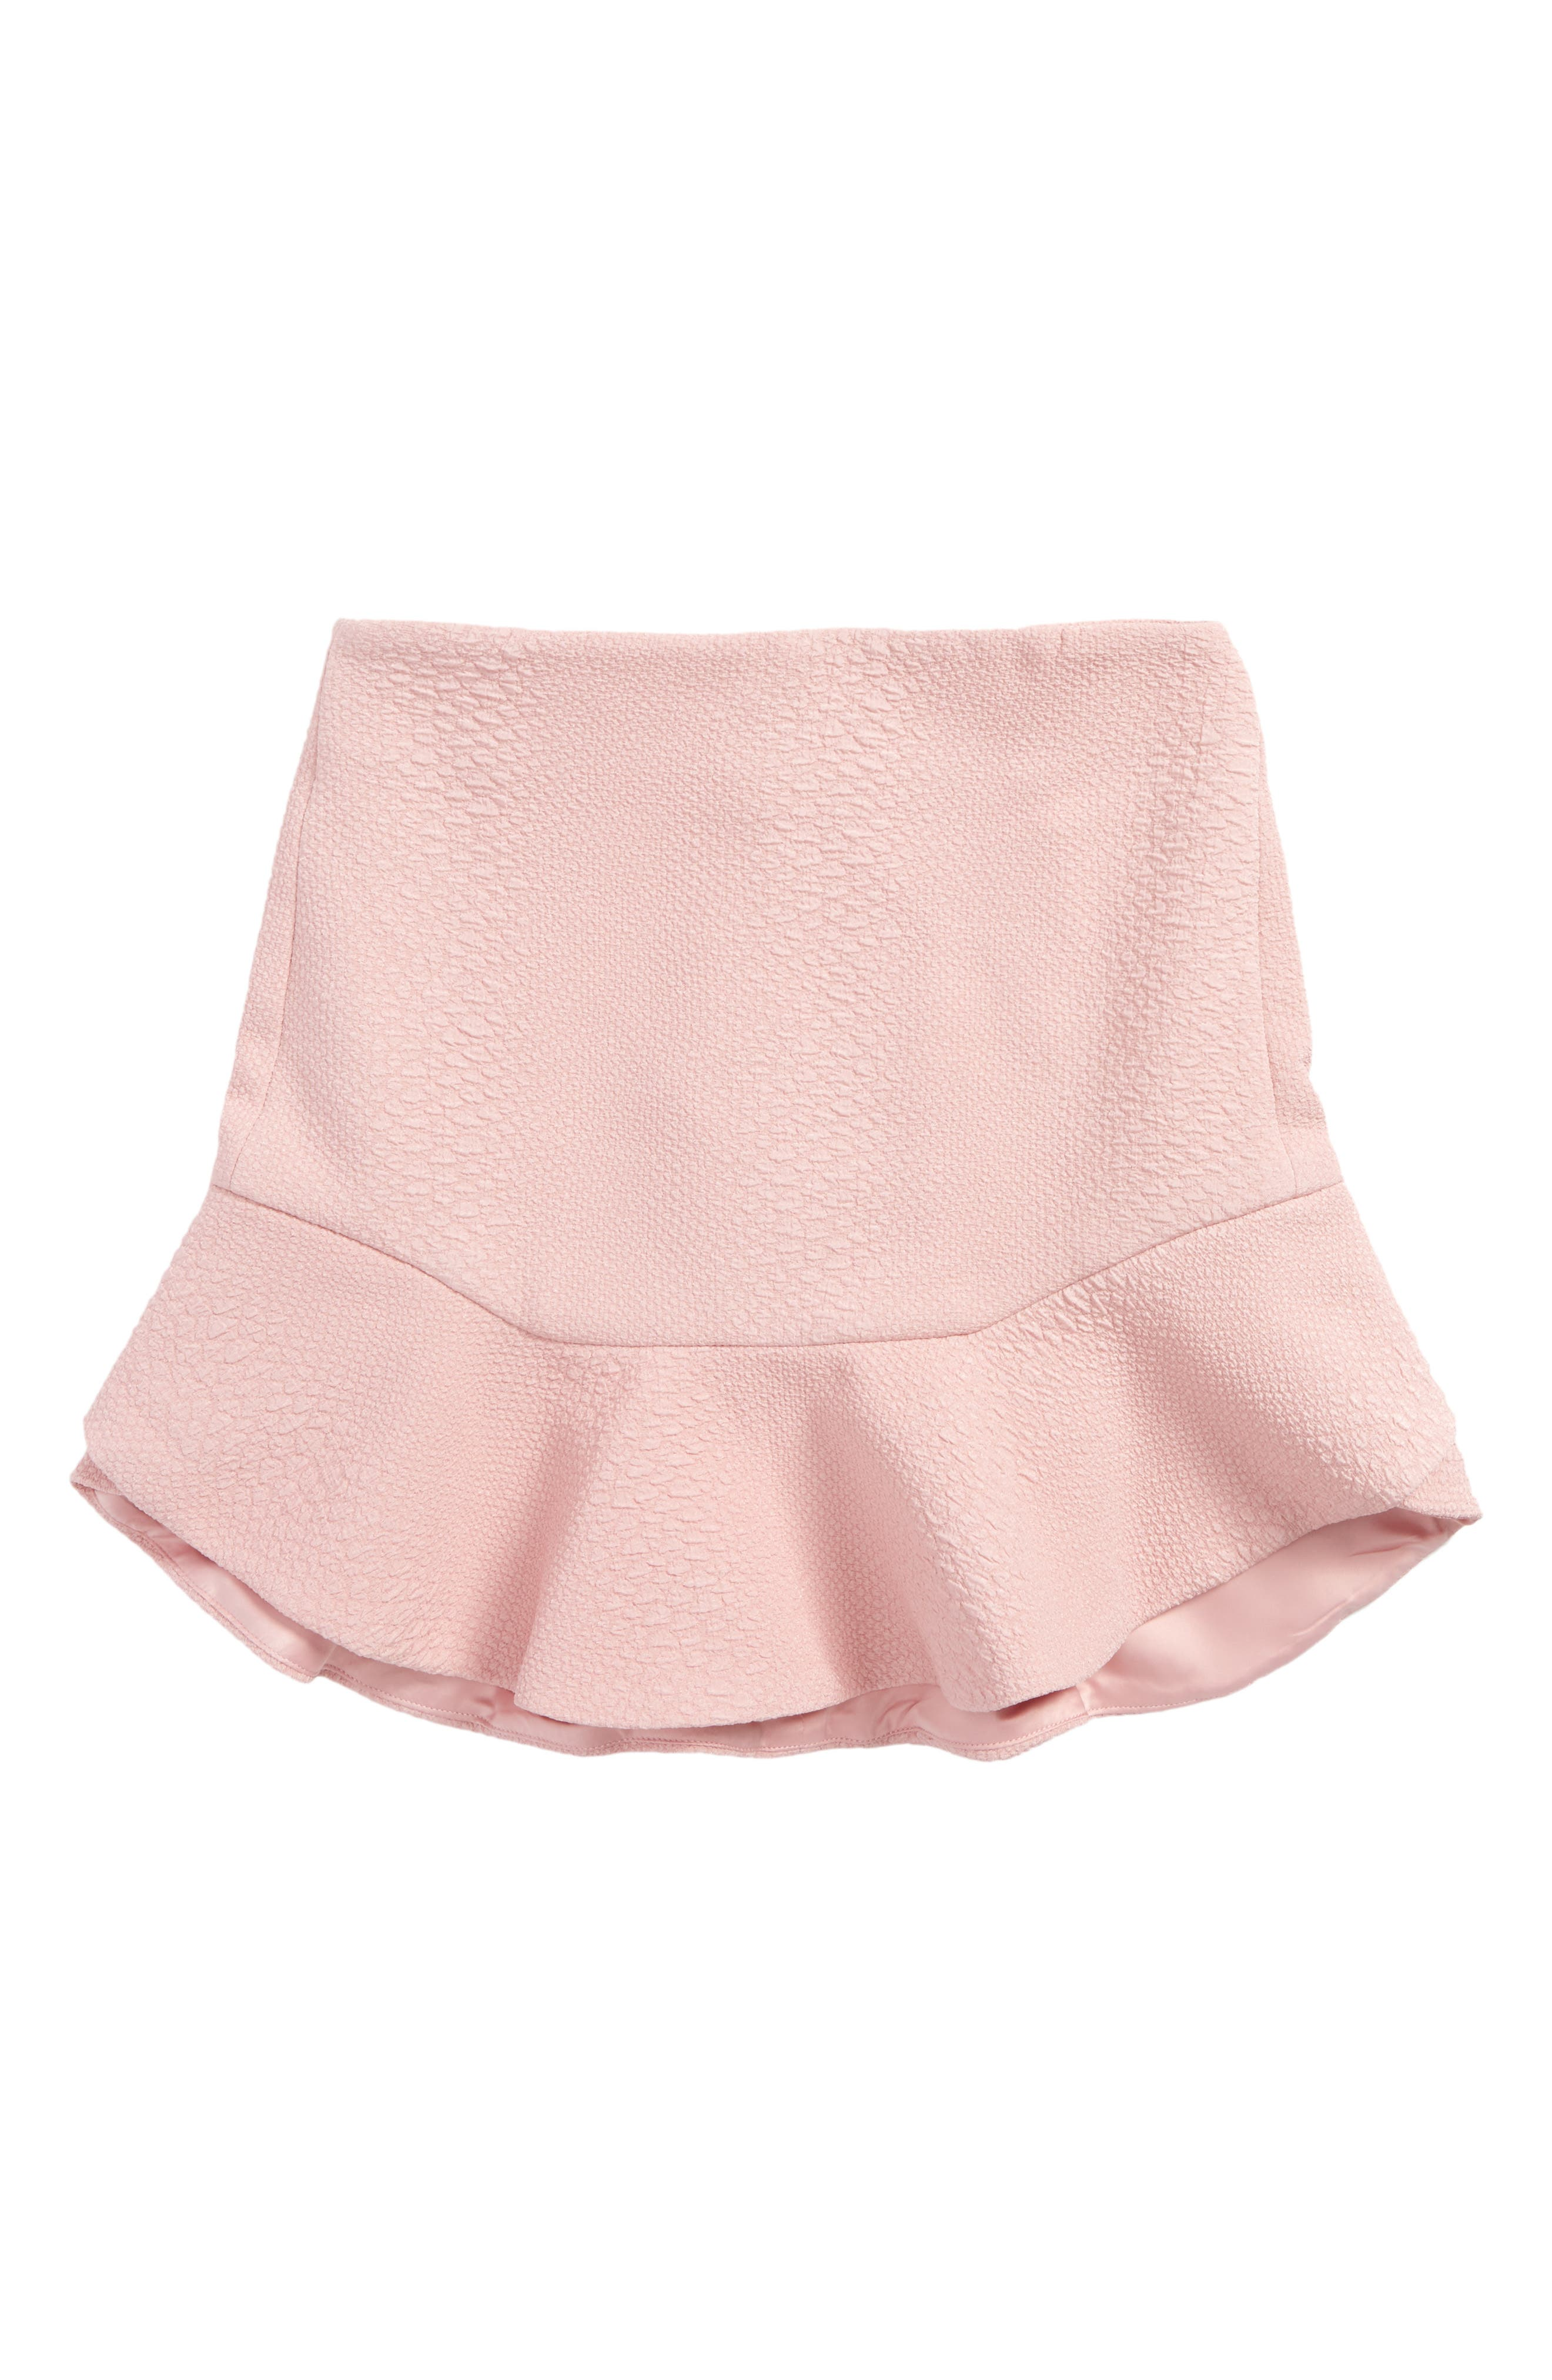 Alternate Image 1 Selected - Bardot Junior Frill Skirt (Big Girls)